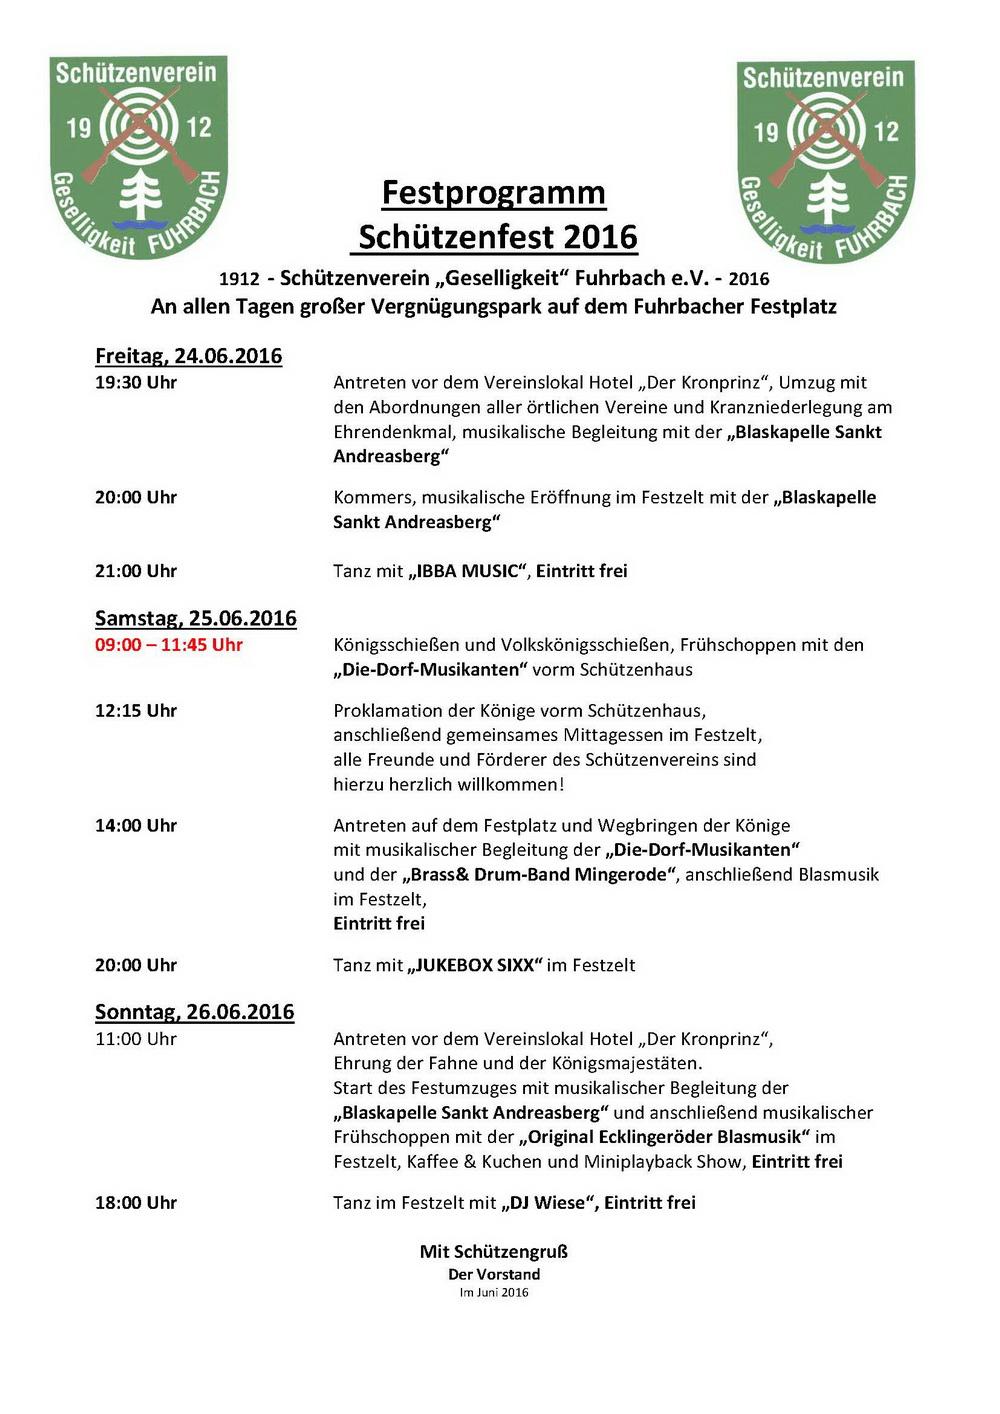 Schuetzenfest 2016 Festprogramm_2